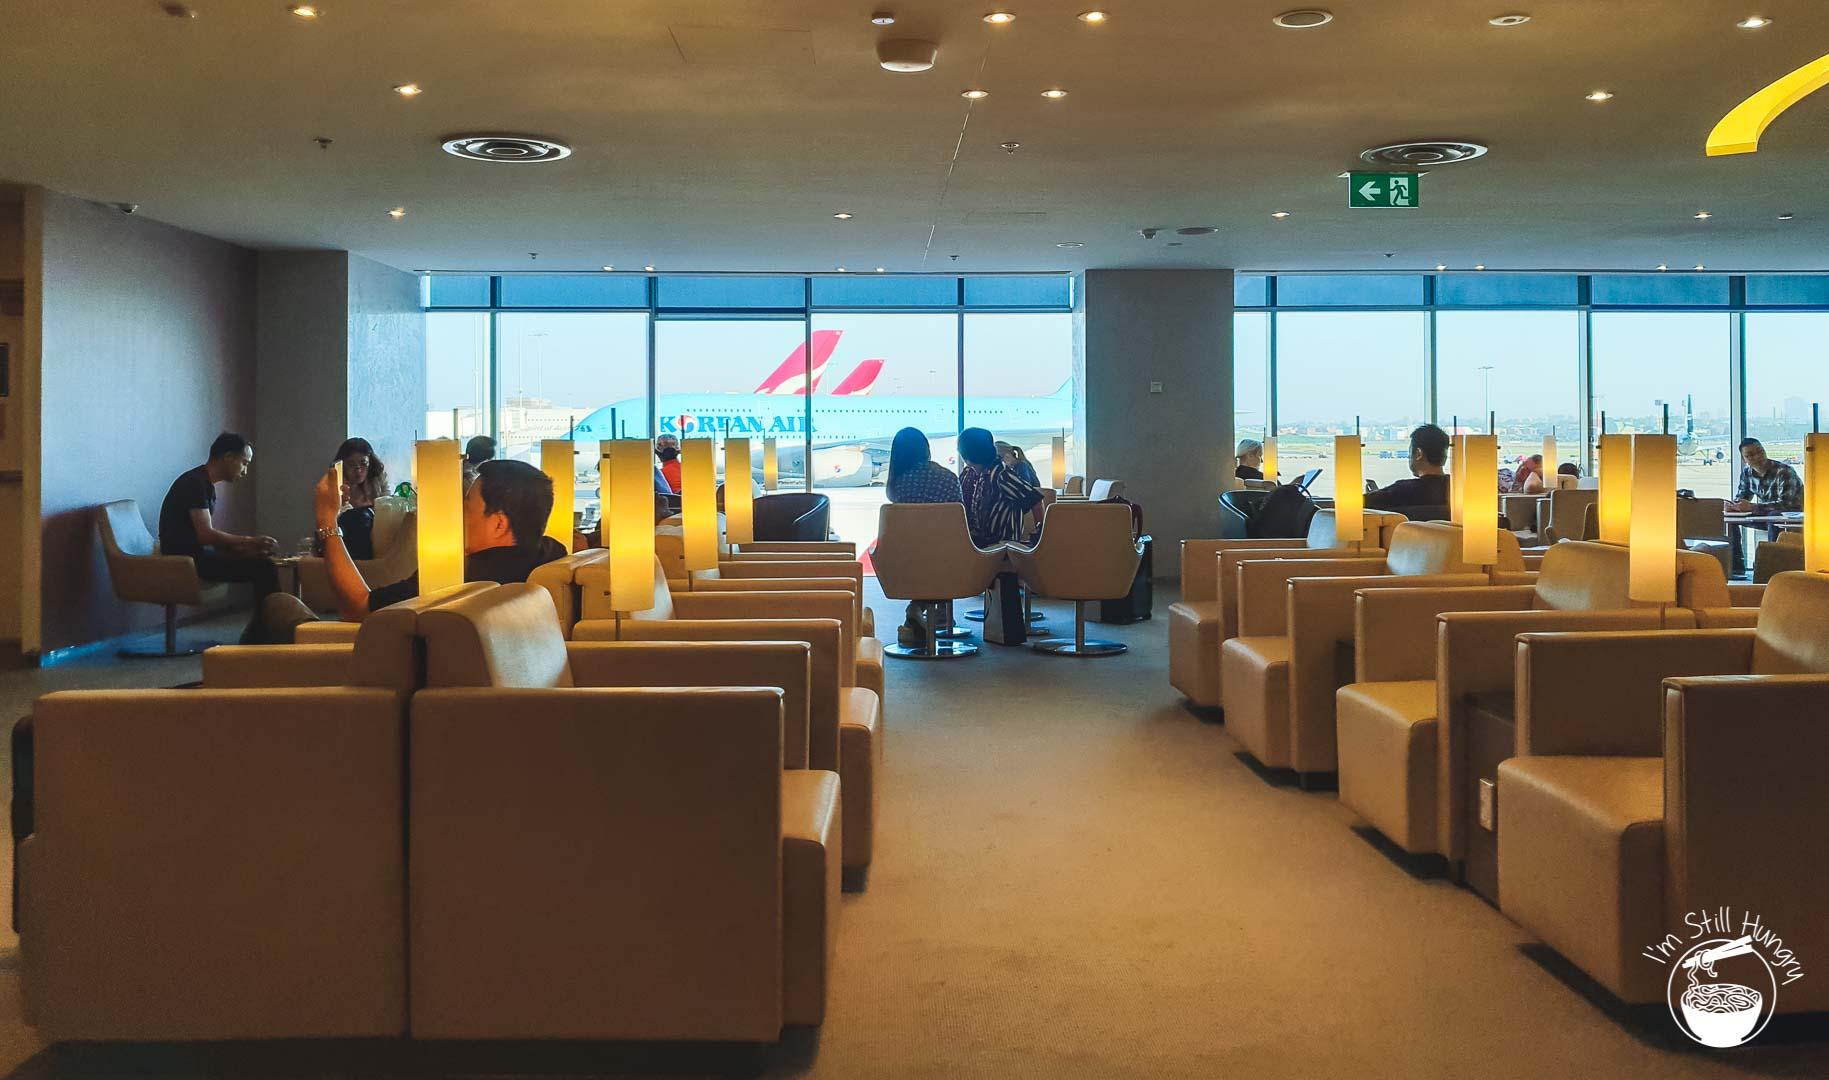 Skyteam Lounge Sydney Airport